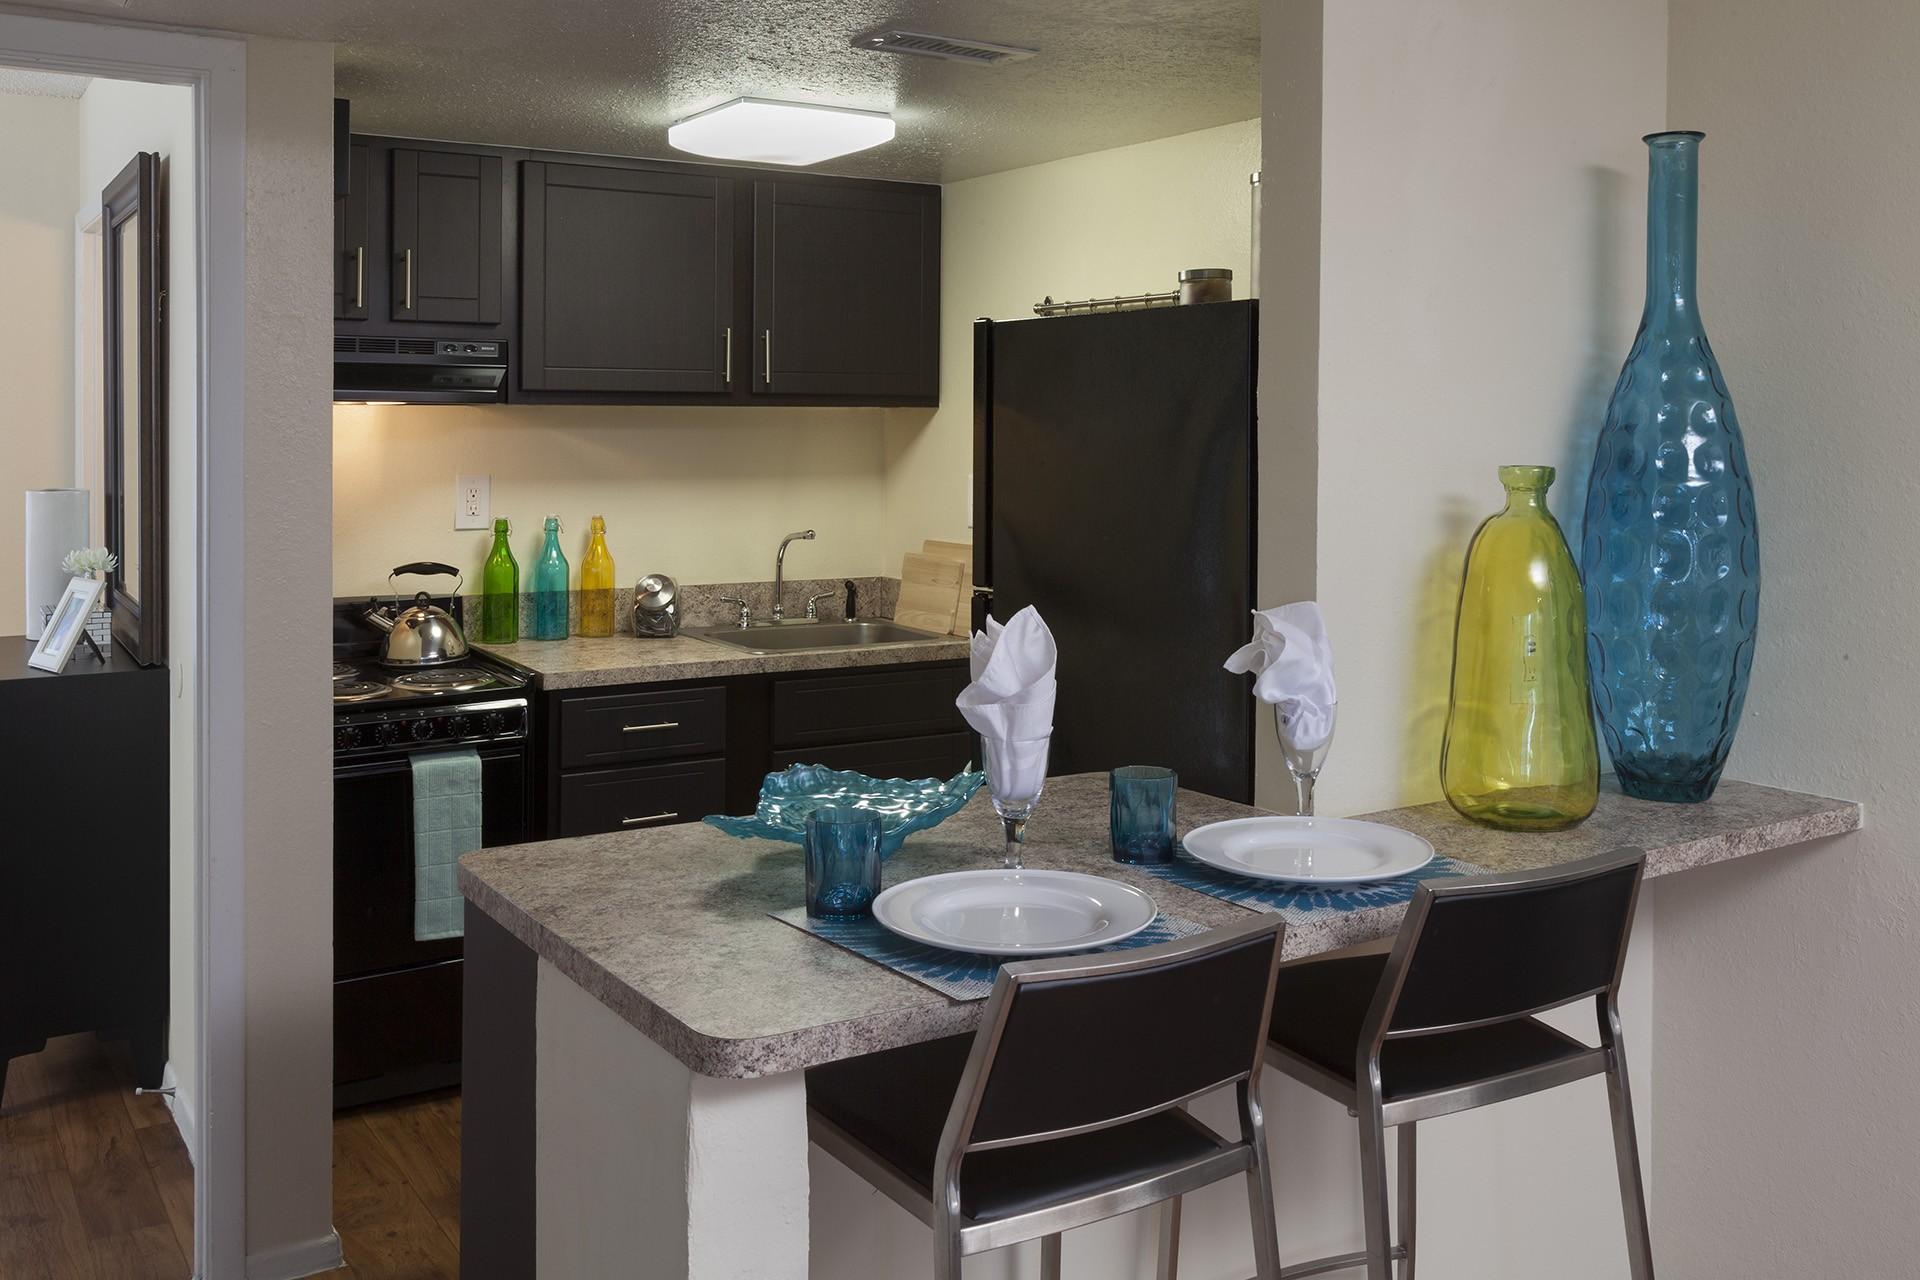 Apartments Near NSU Cameron Cove for Nova Southeastern University Students in Fort Lauderdale, FL